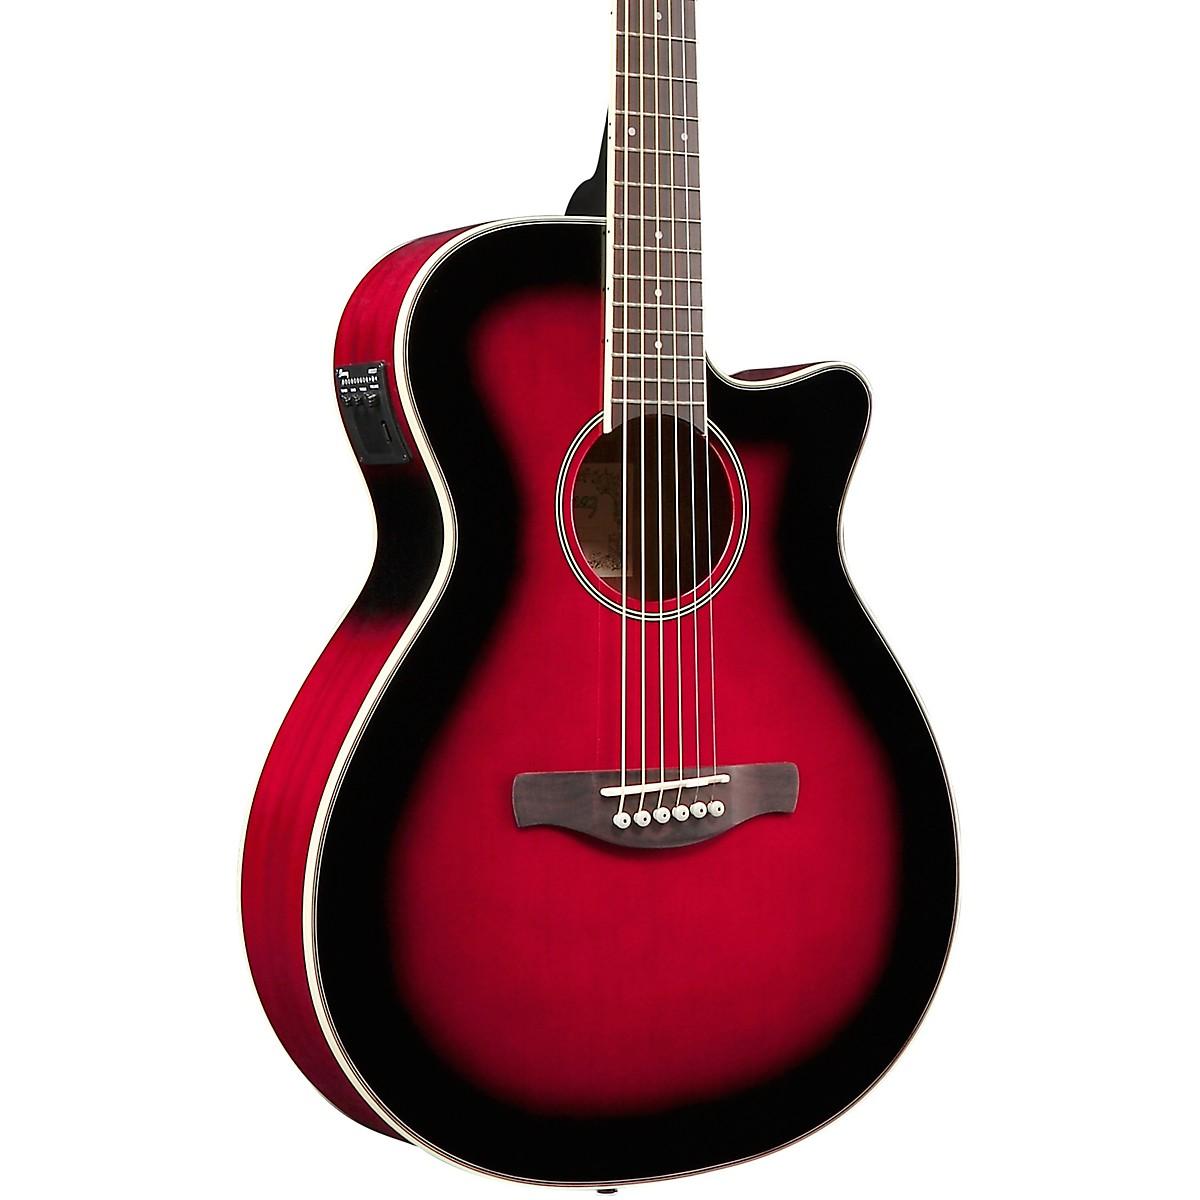 Ibanez AEG8E Cutaway Acoustic-Electric Guitar